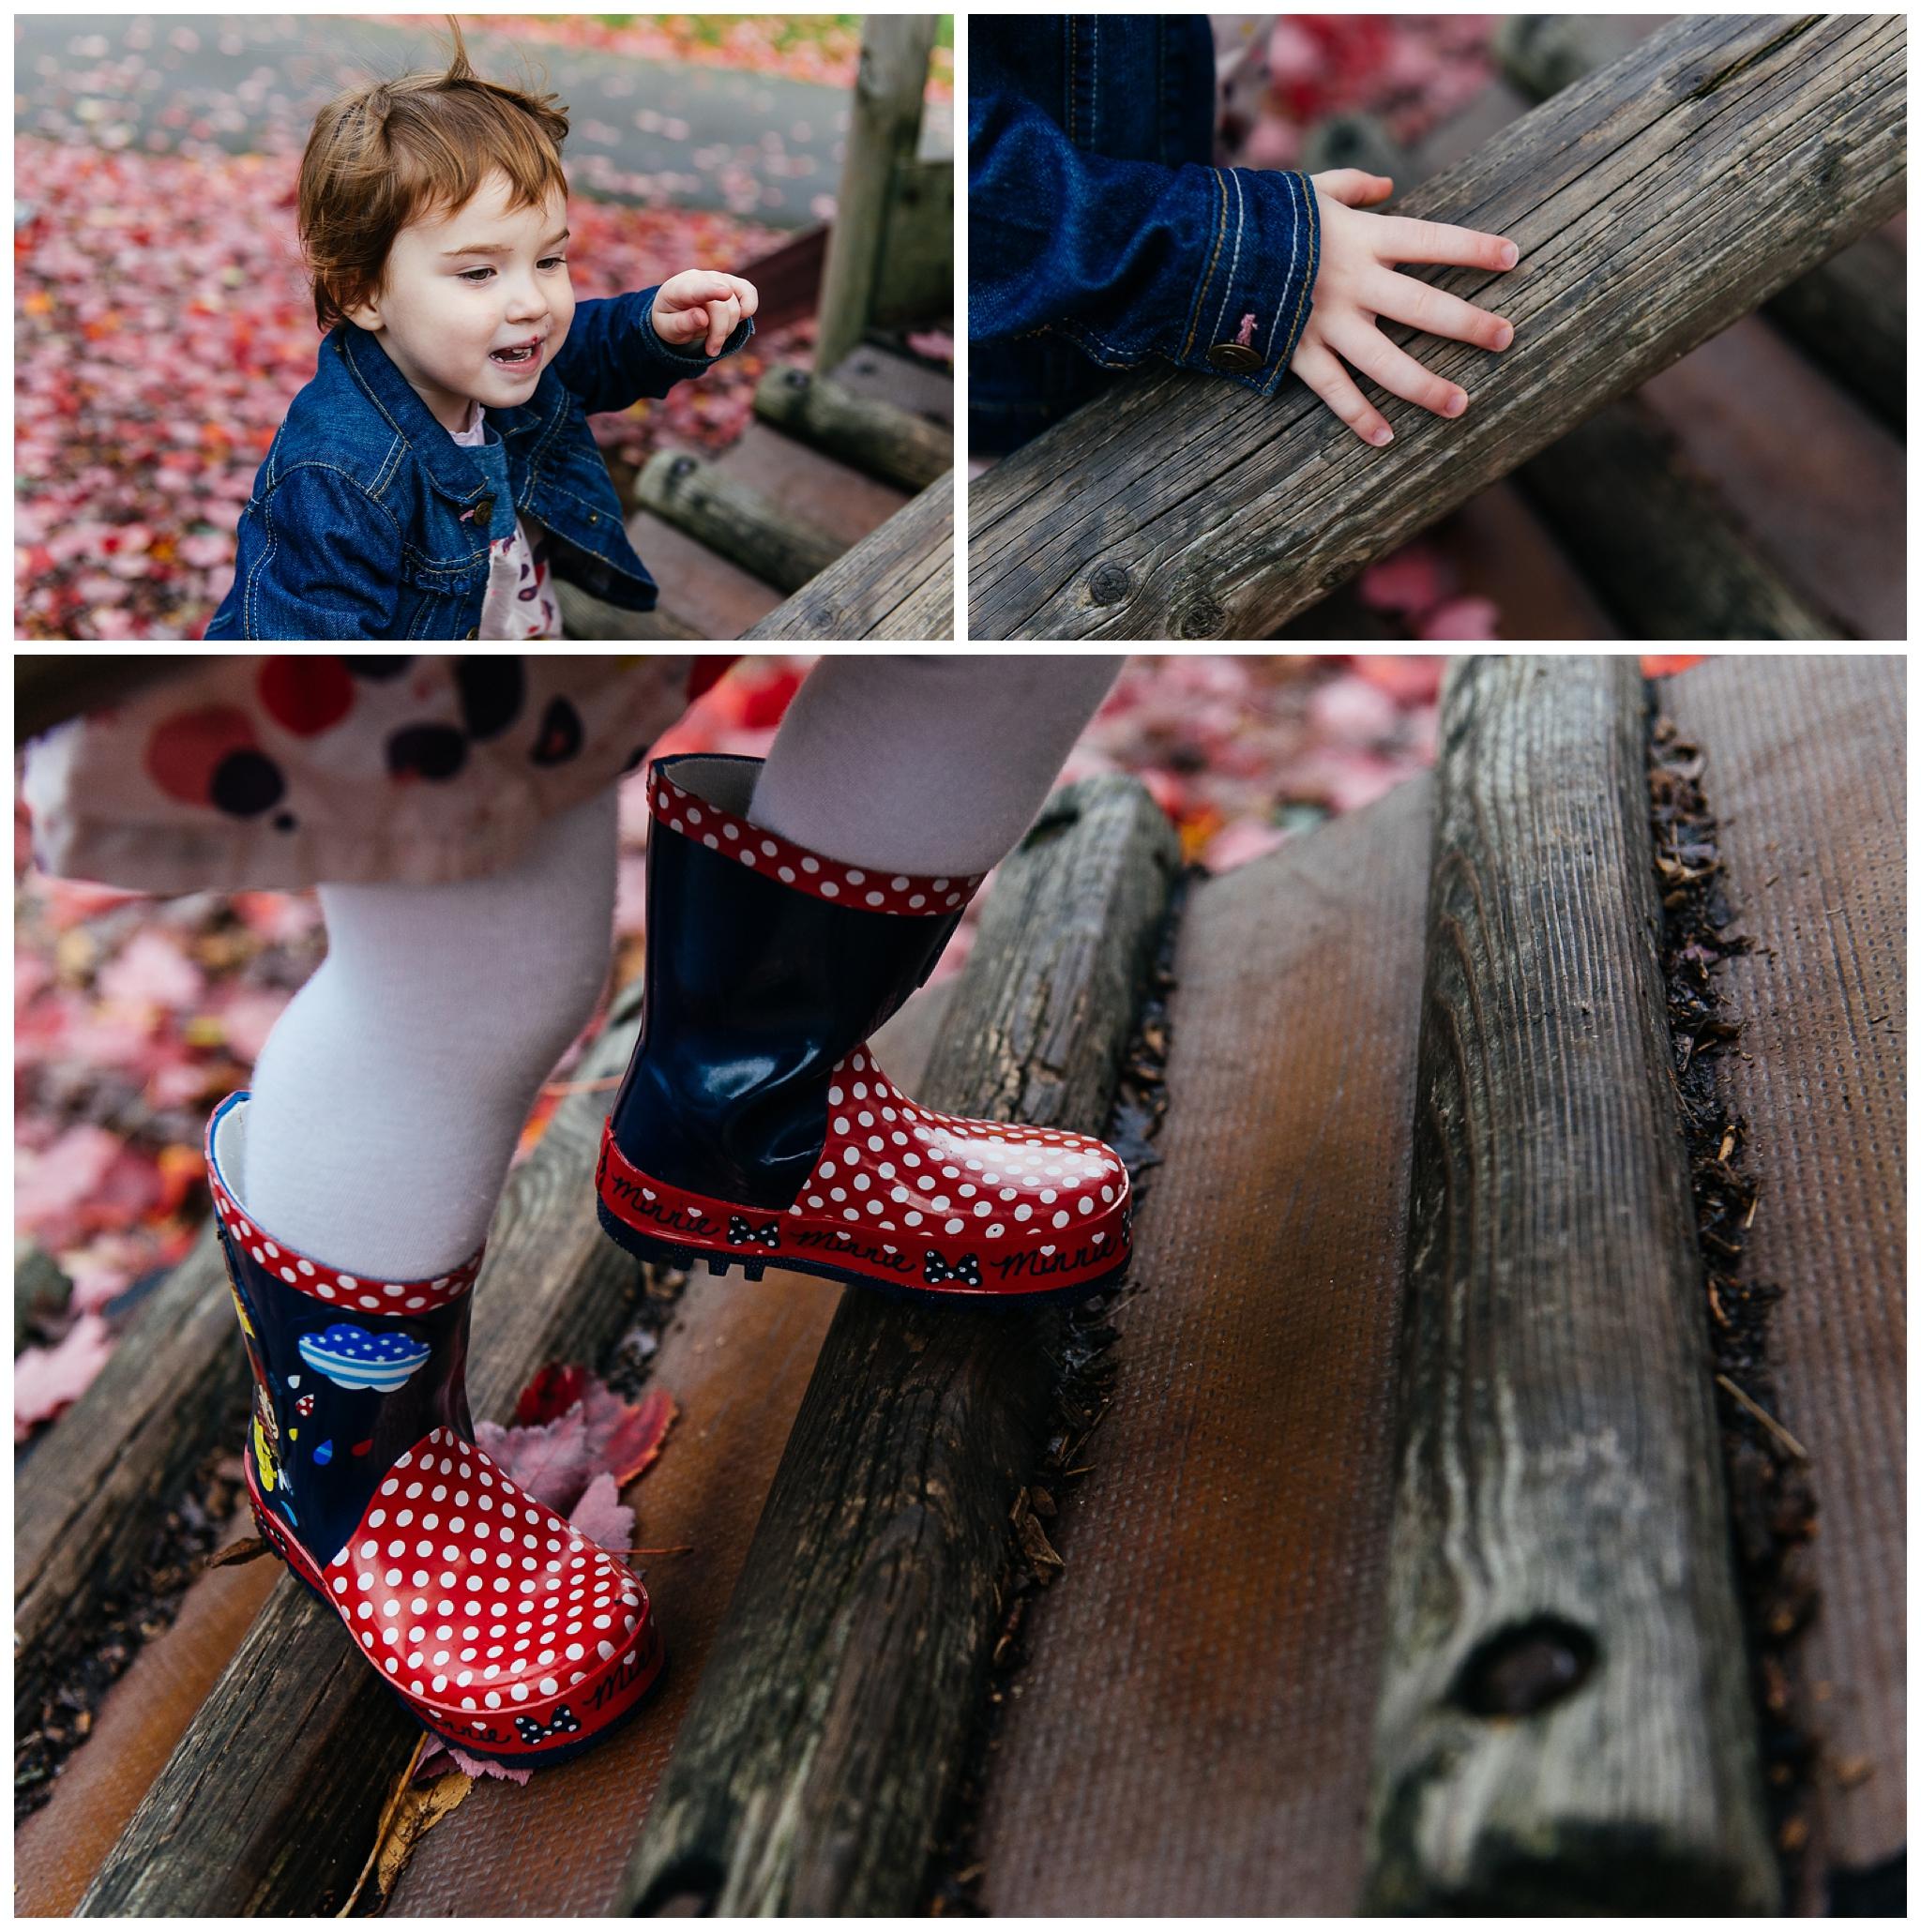 Autumn-family-portraits-birmingham-photographer_0006.jpg